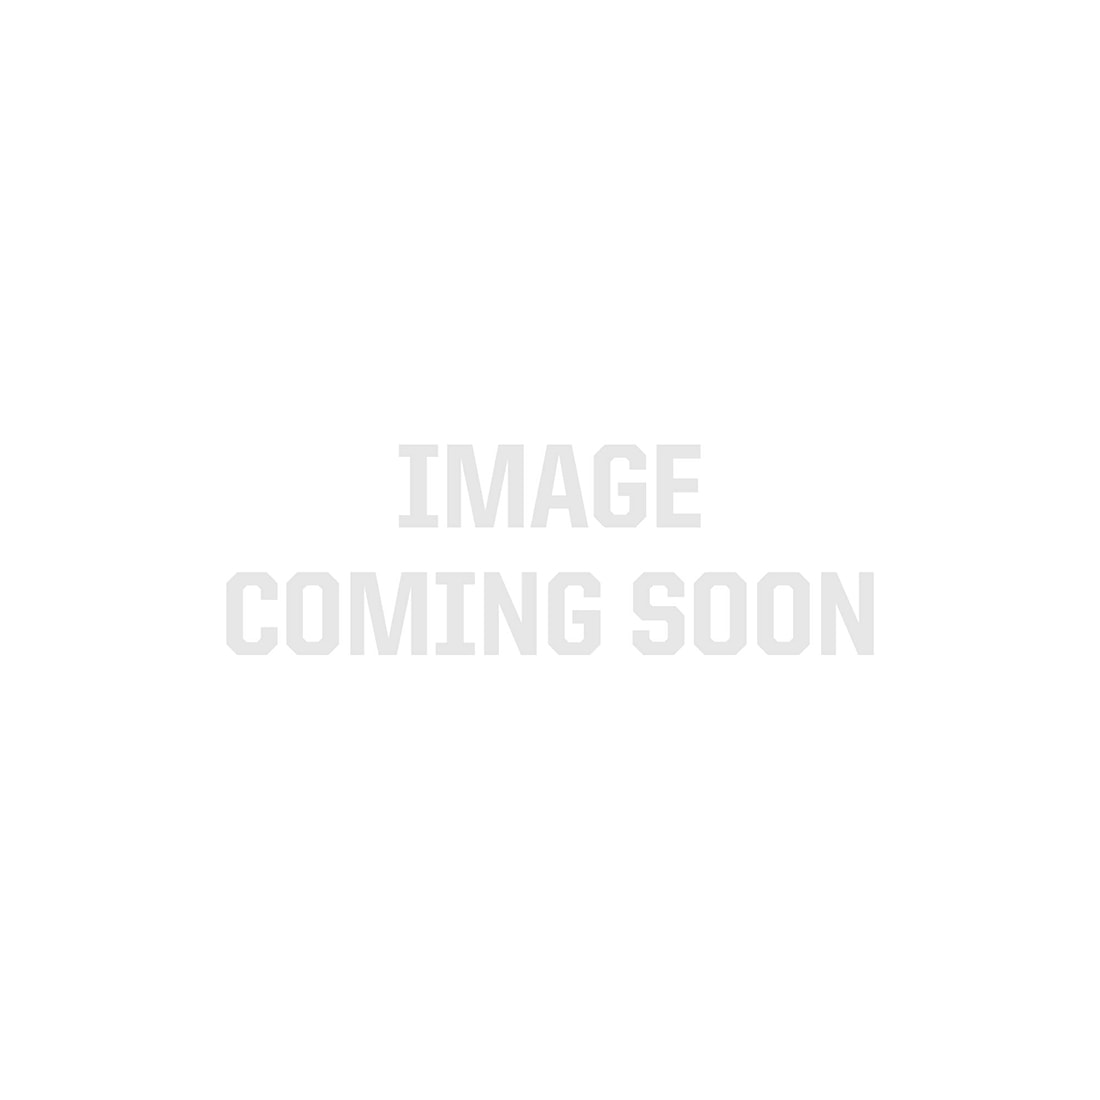 Waterproof RGB + 6,500K 4-in-1 XL PixelControl LED Strip Light - 60/m - 3m